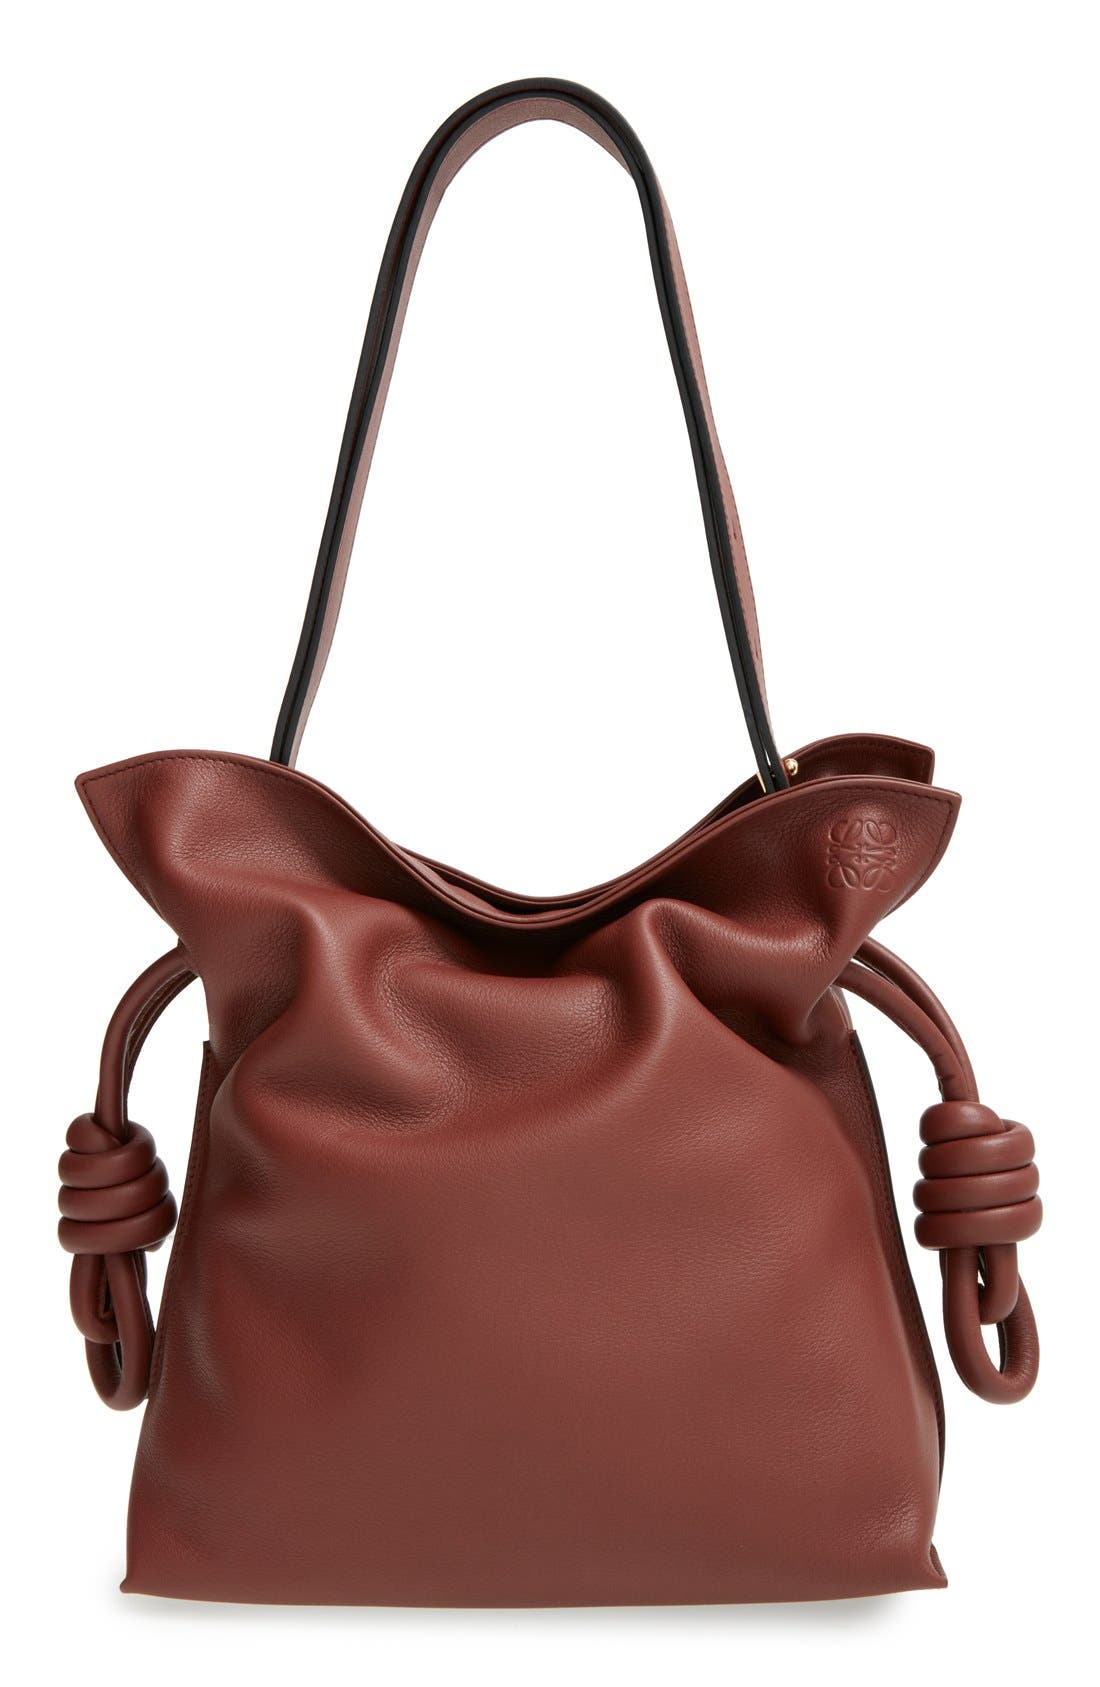 Loewe 'Small Flamenco Knot' Calfskin Leather Bag